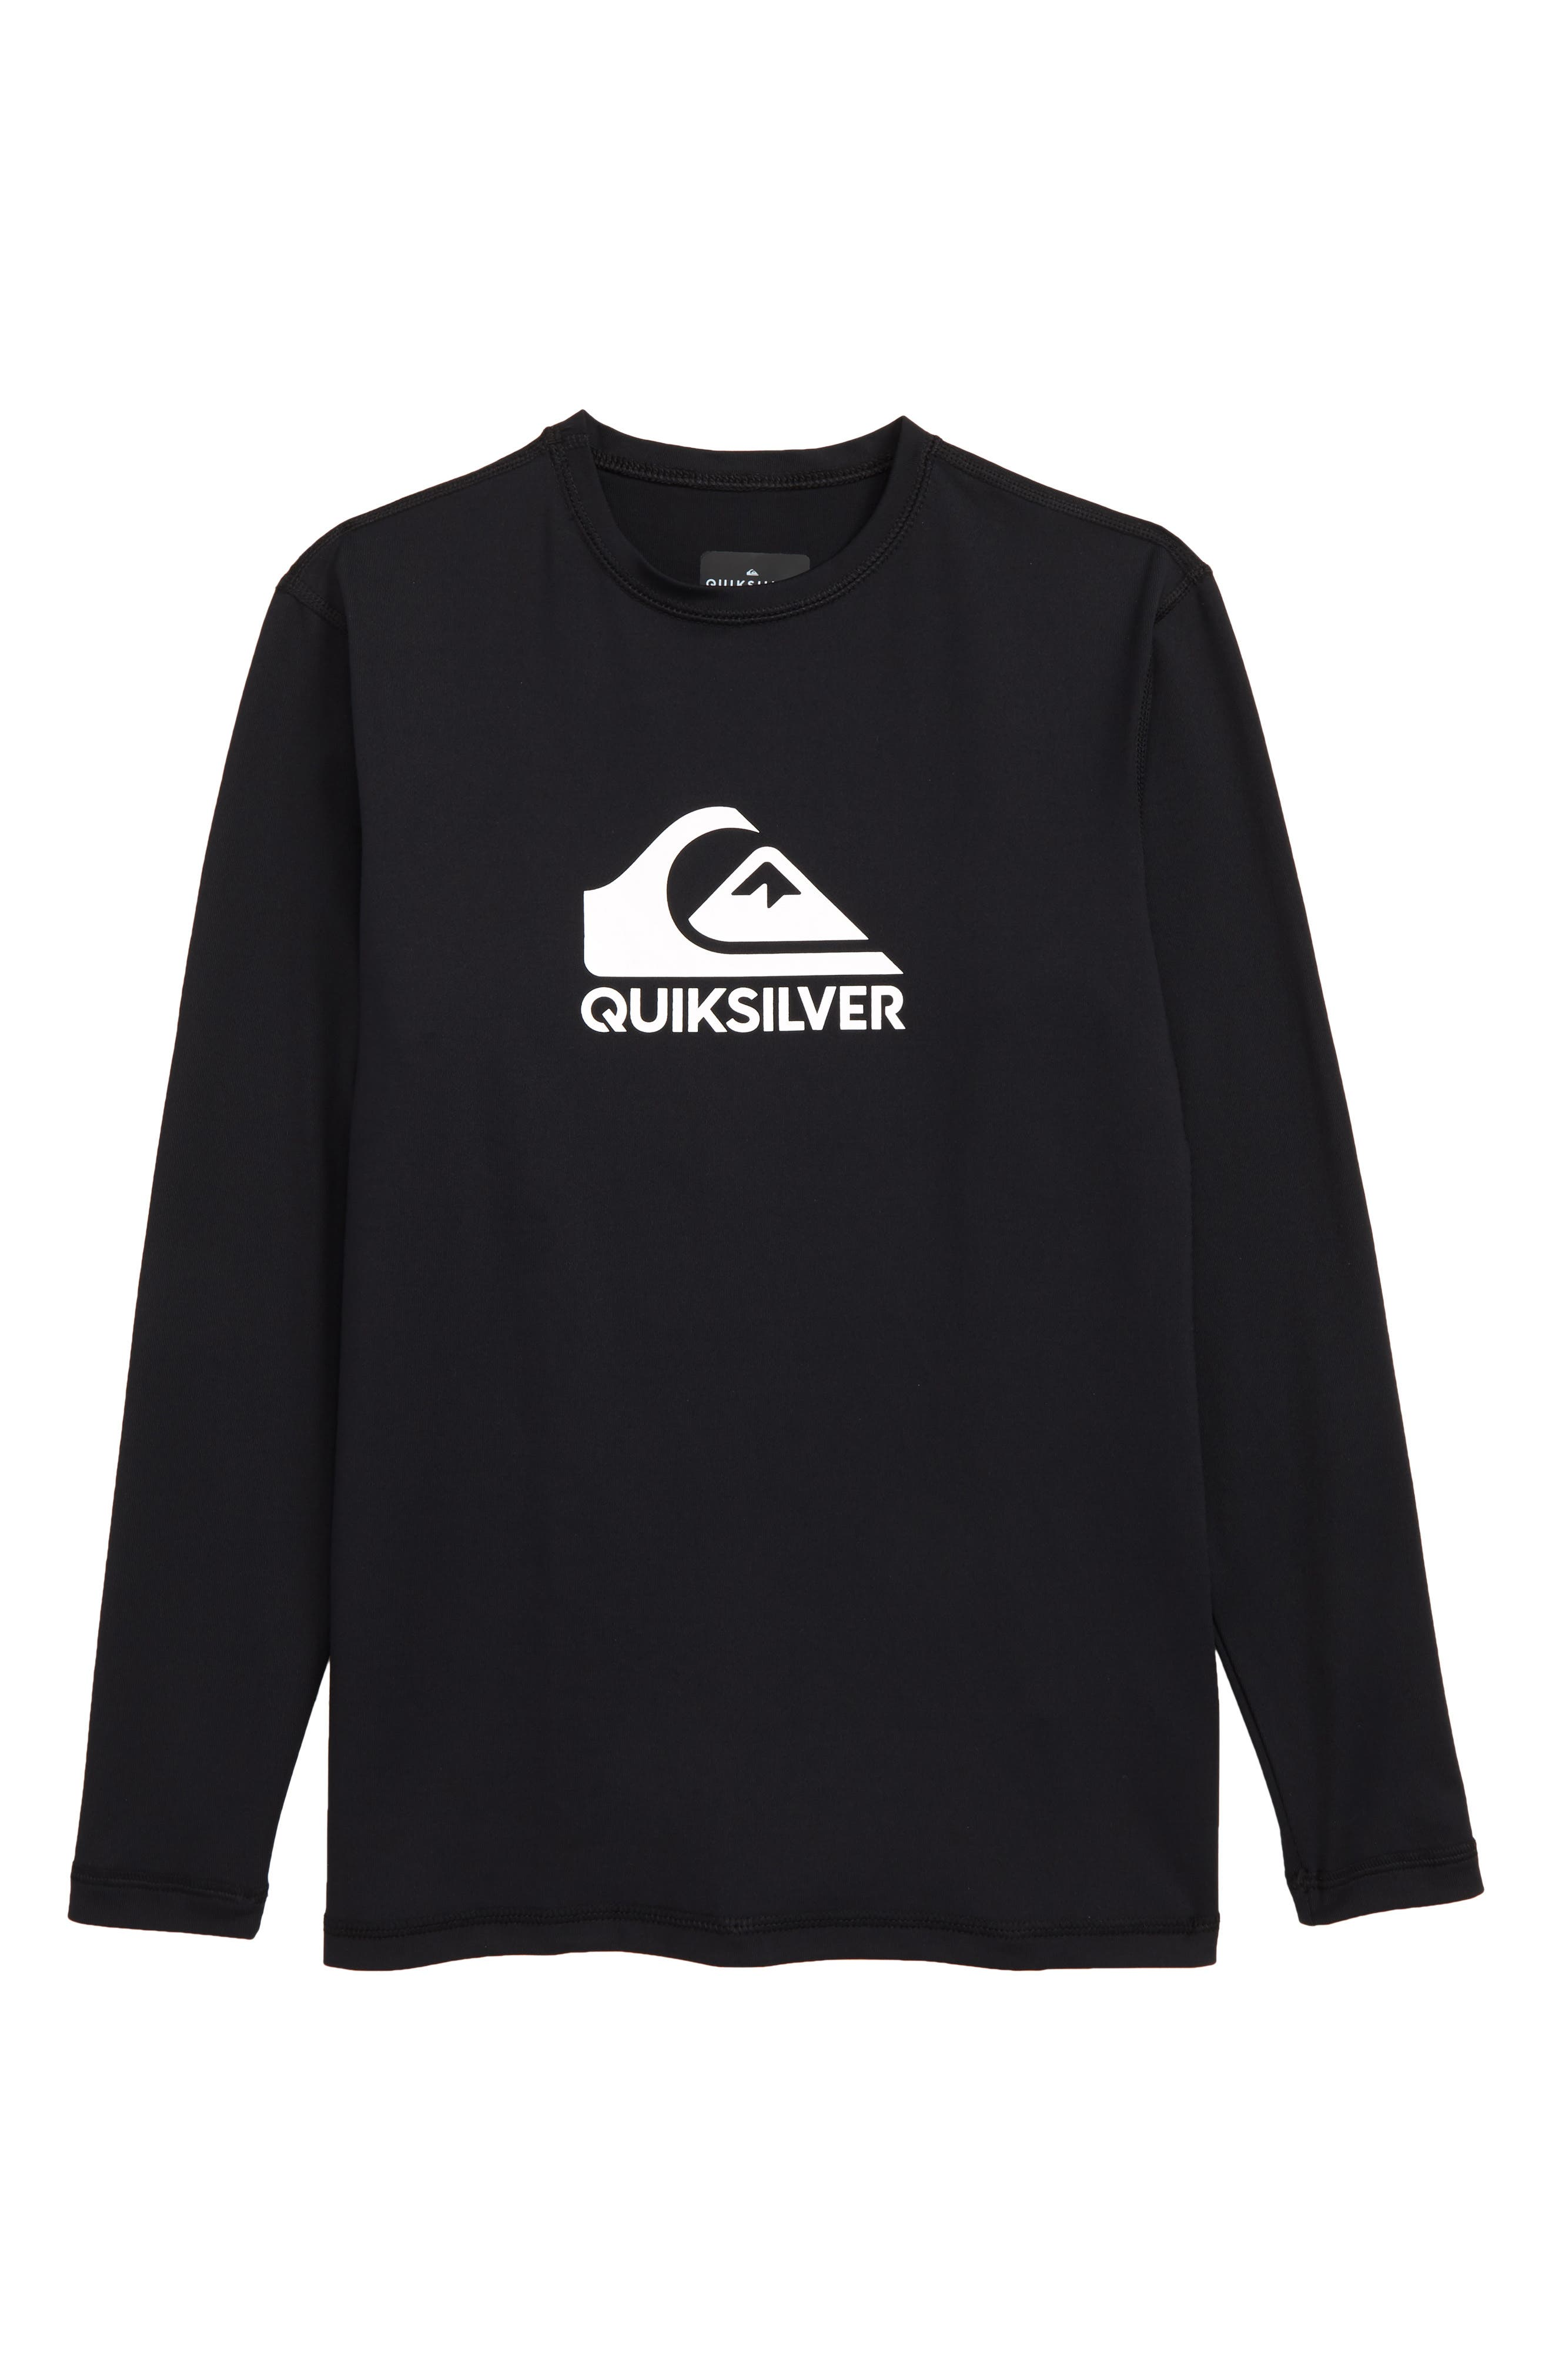 QUIKSILVER Solid Streak Long Sleeve Rashguard, Main, color, BLACK